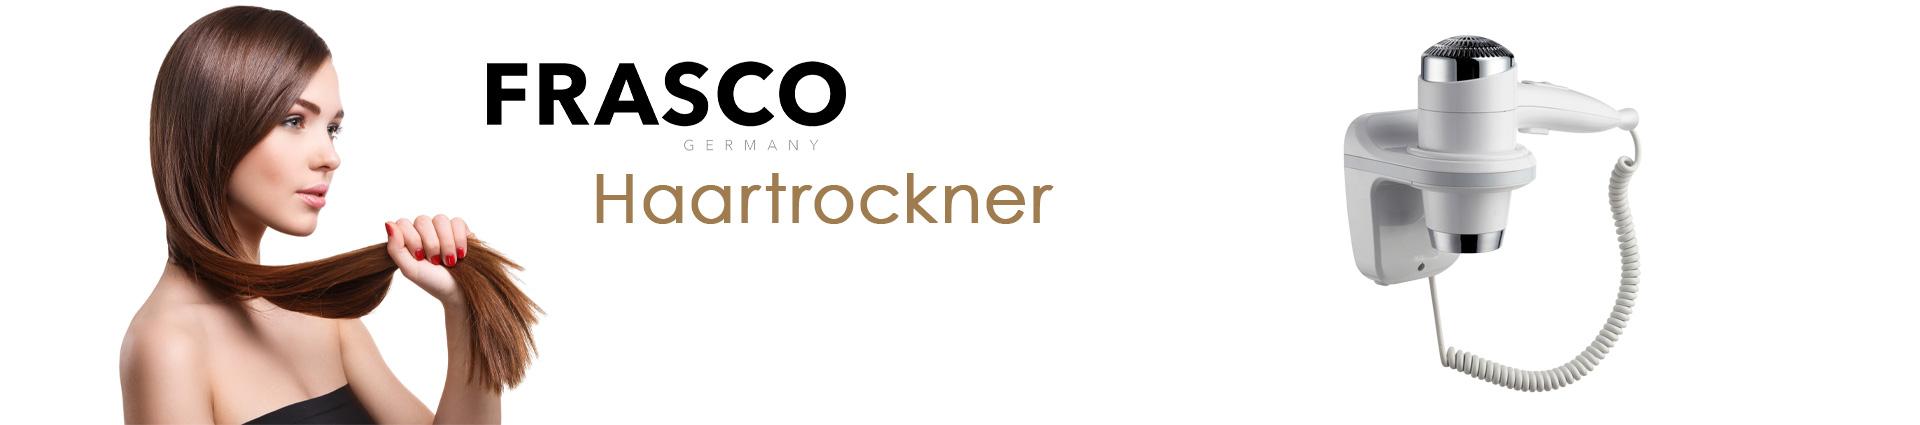 Frasco Haartrockner Banner